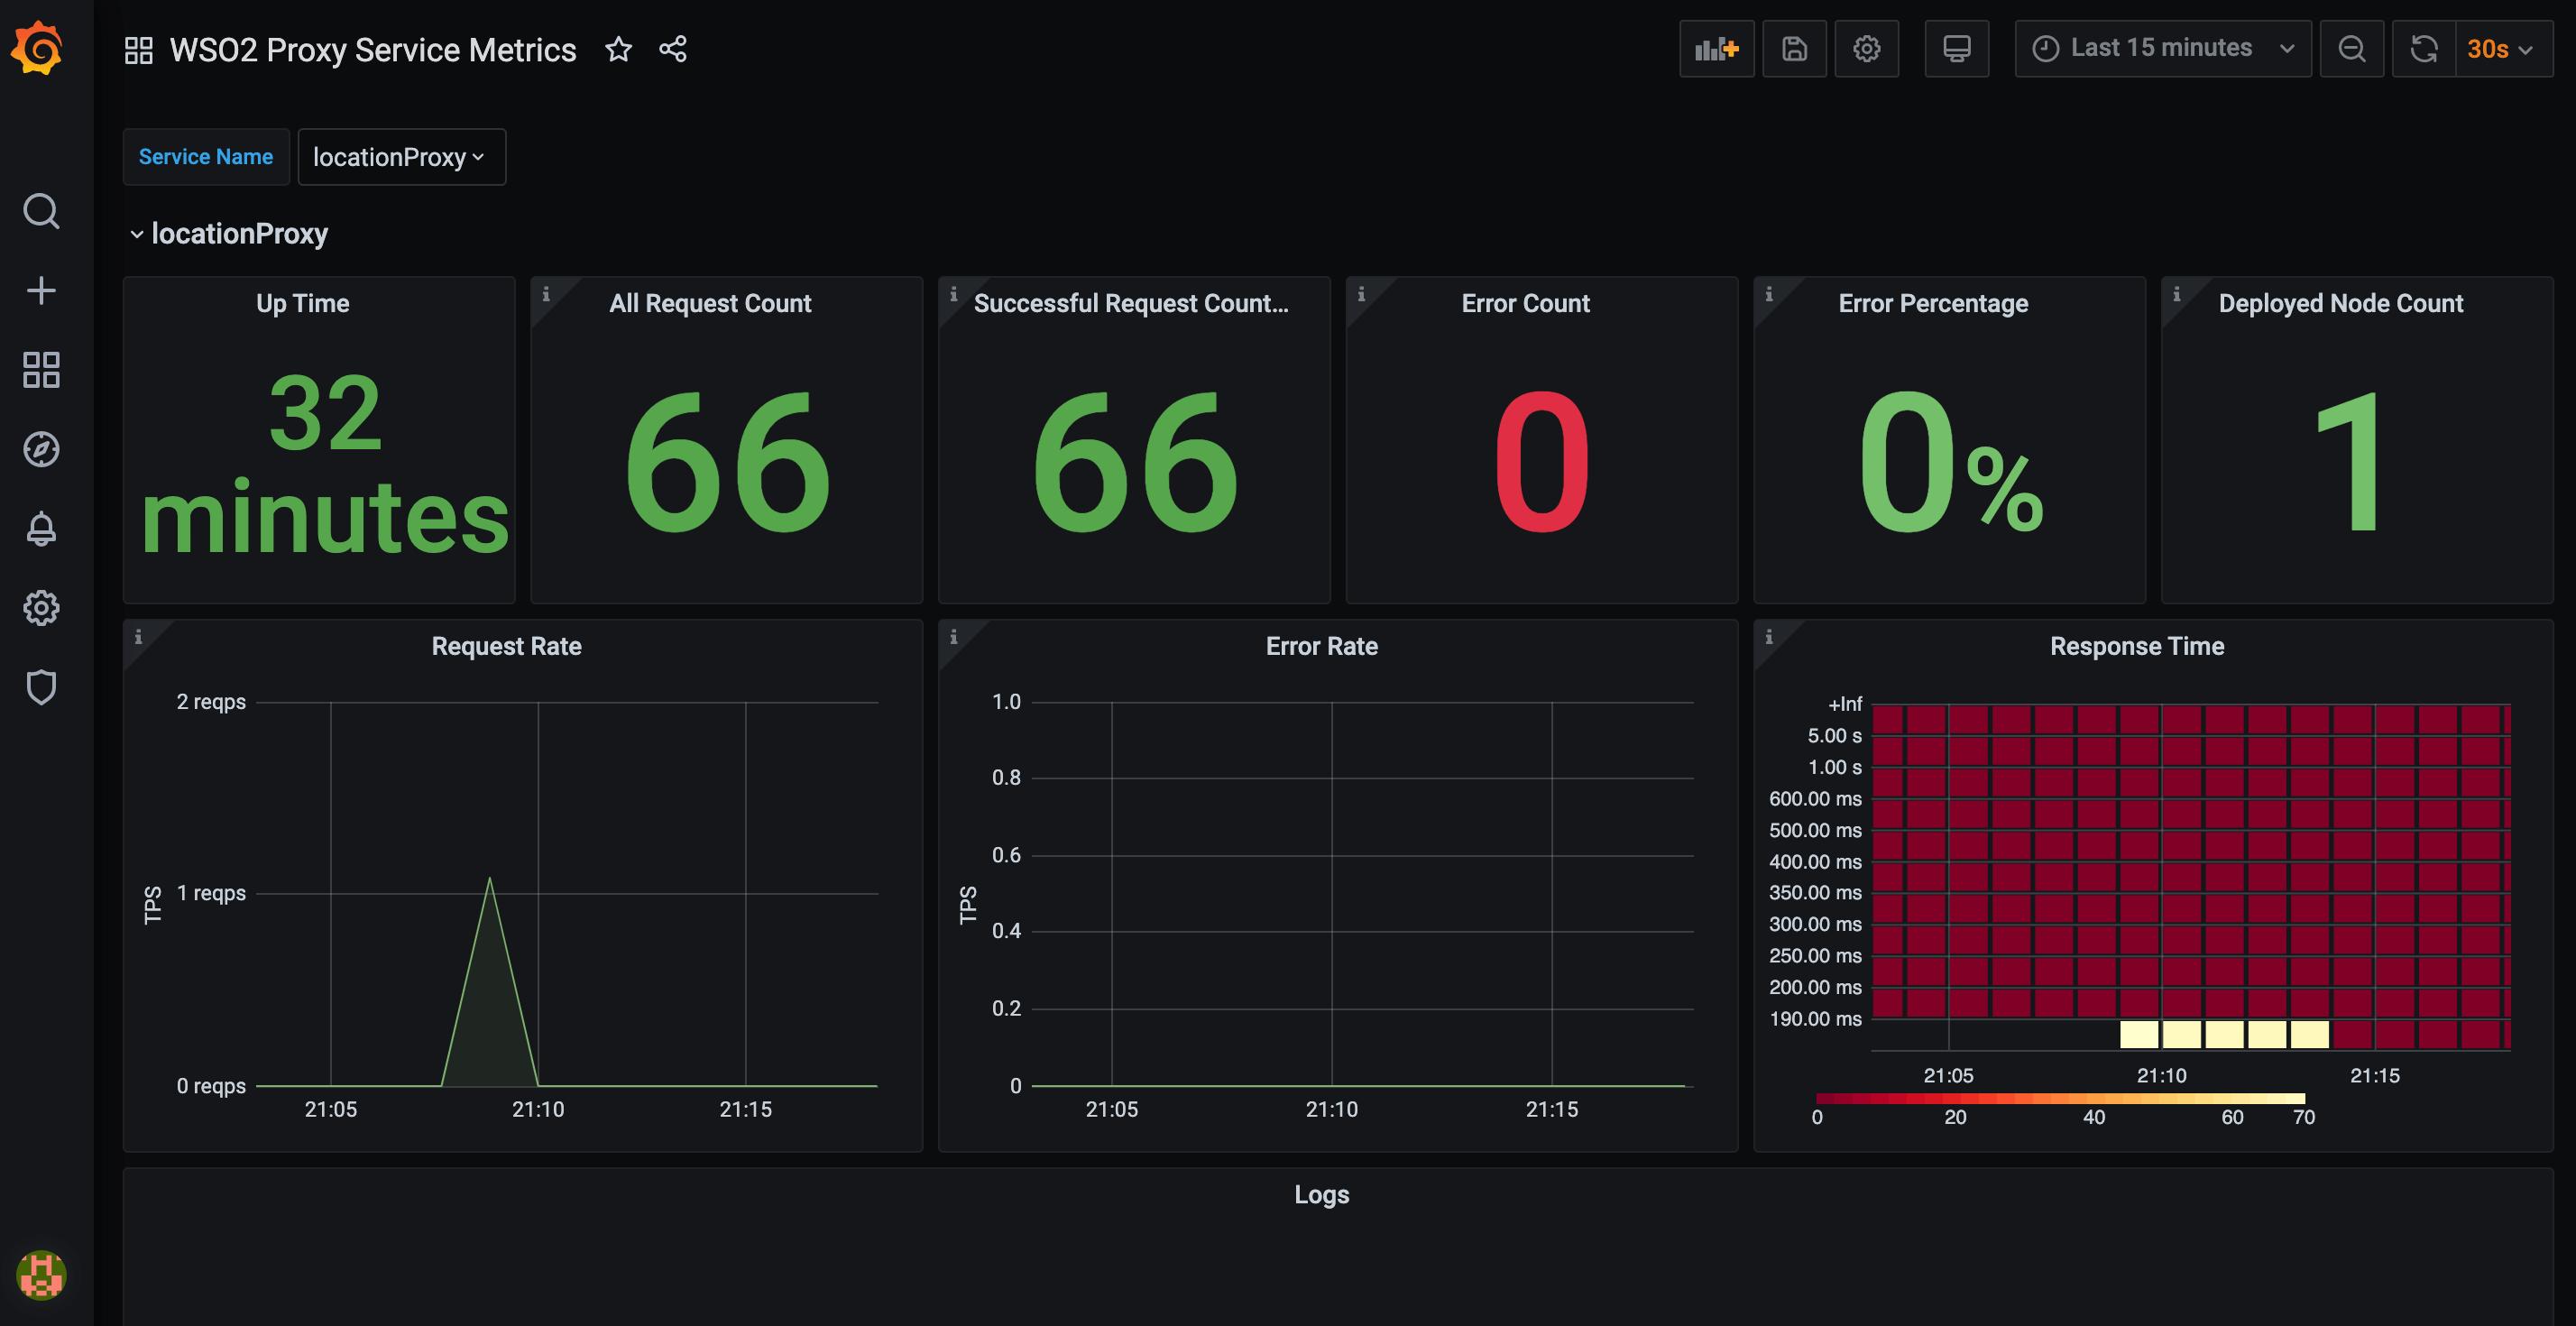 Proxy Service Metrics Dashboard